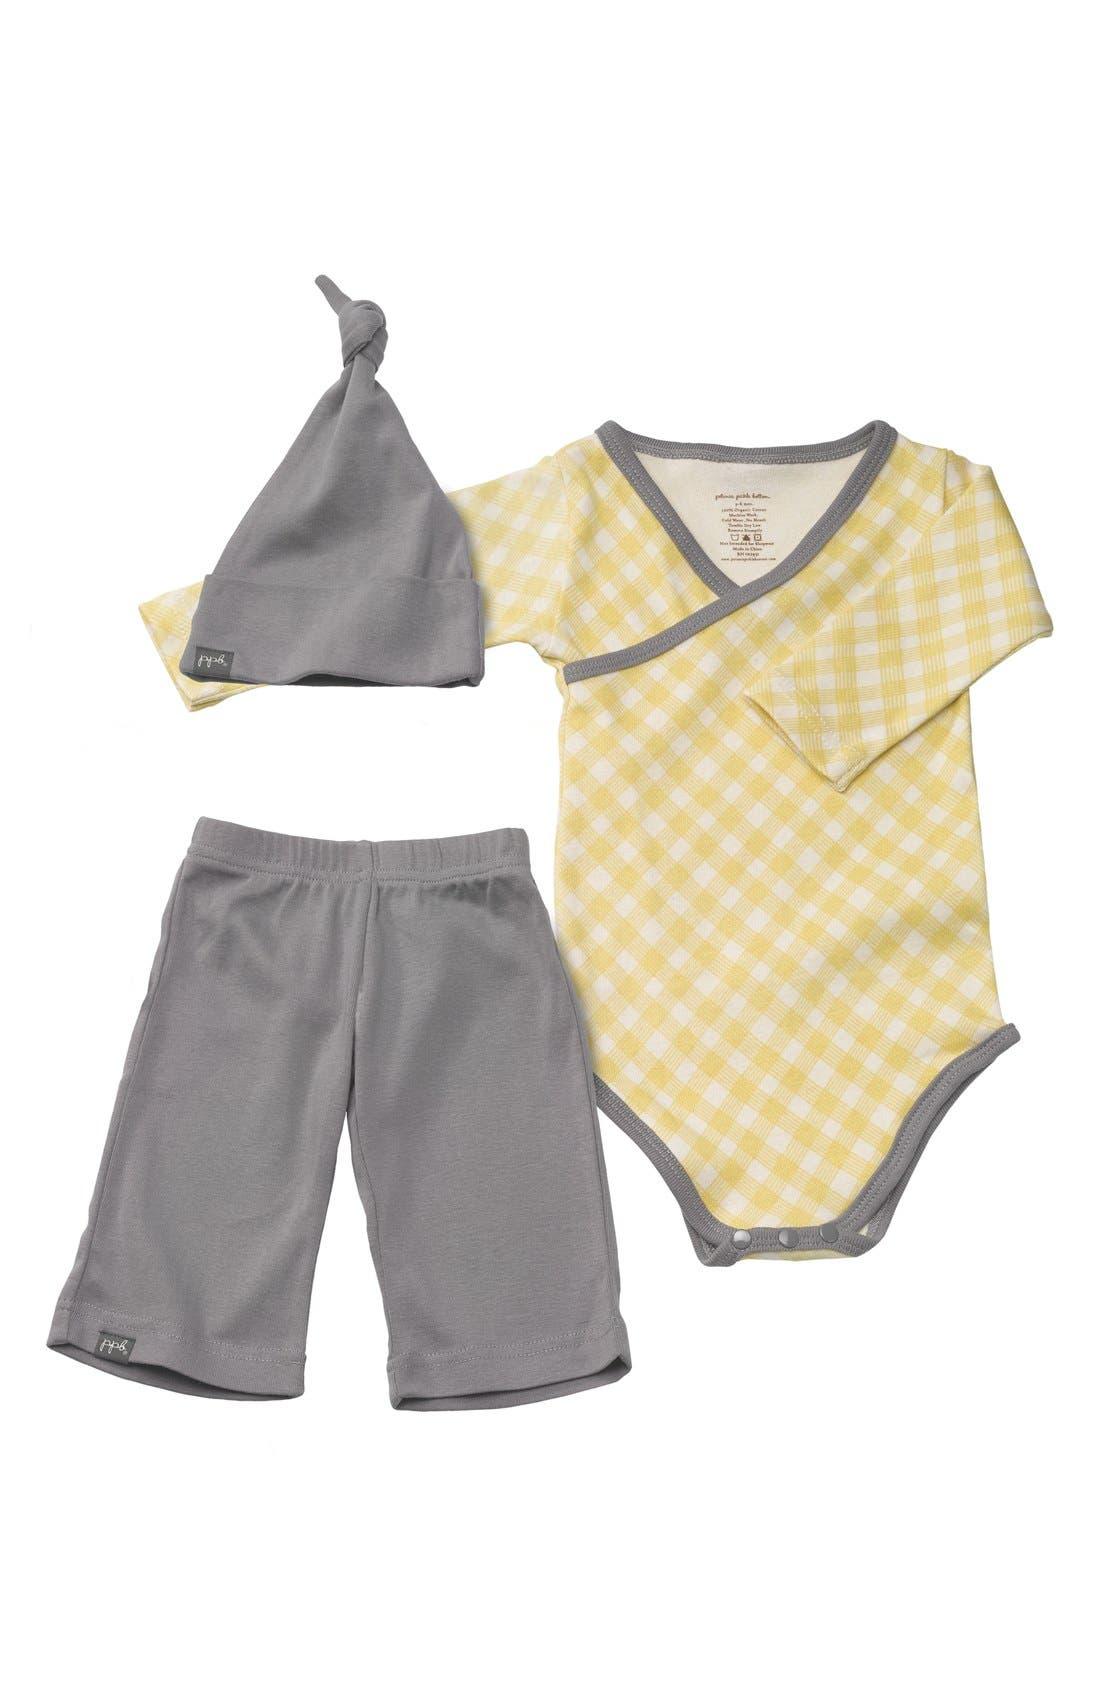 Main Image - Petunia Pickle Bottom 'Social' Organic Cotton Bodysuit, Pants & Hat Set (Baby)